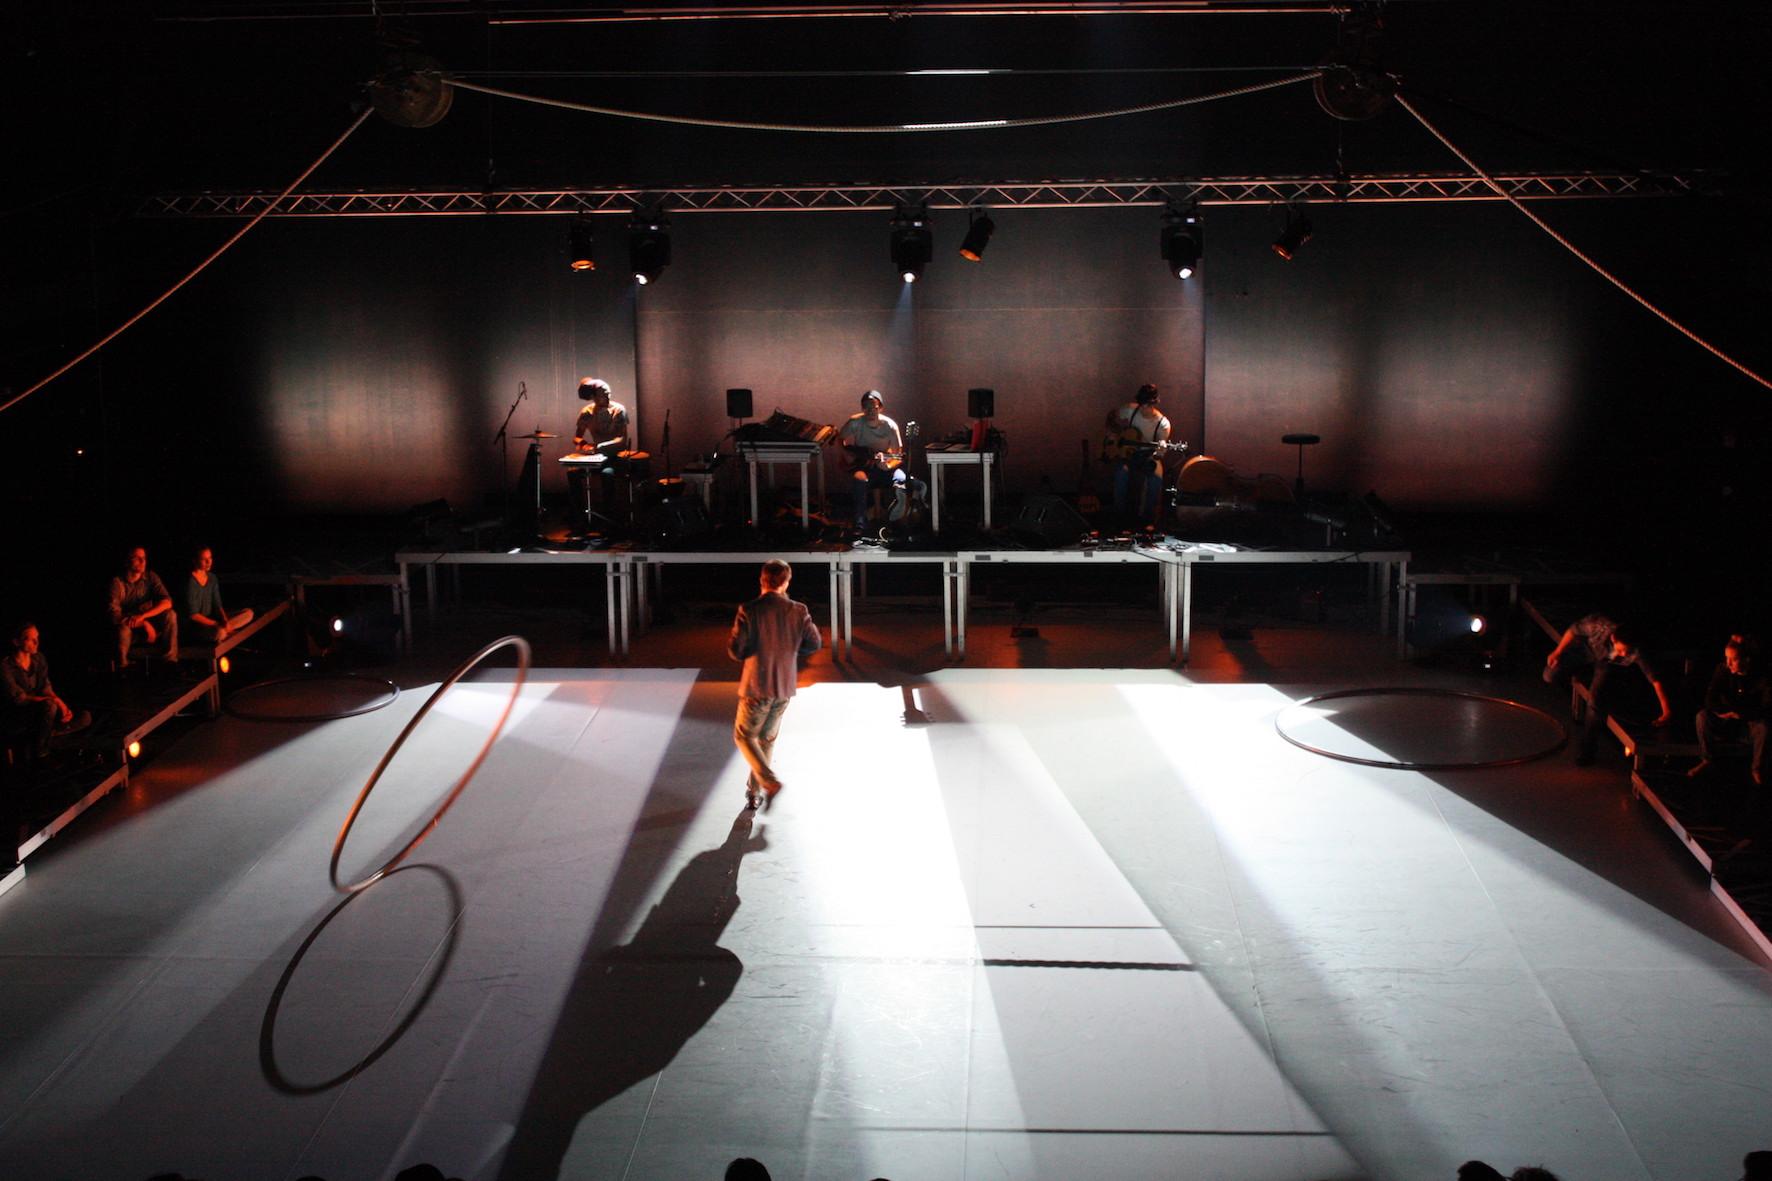 PIENEMPIÄ PALOJA (2013)